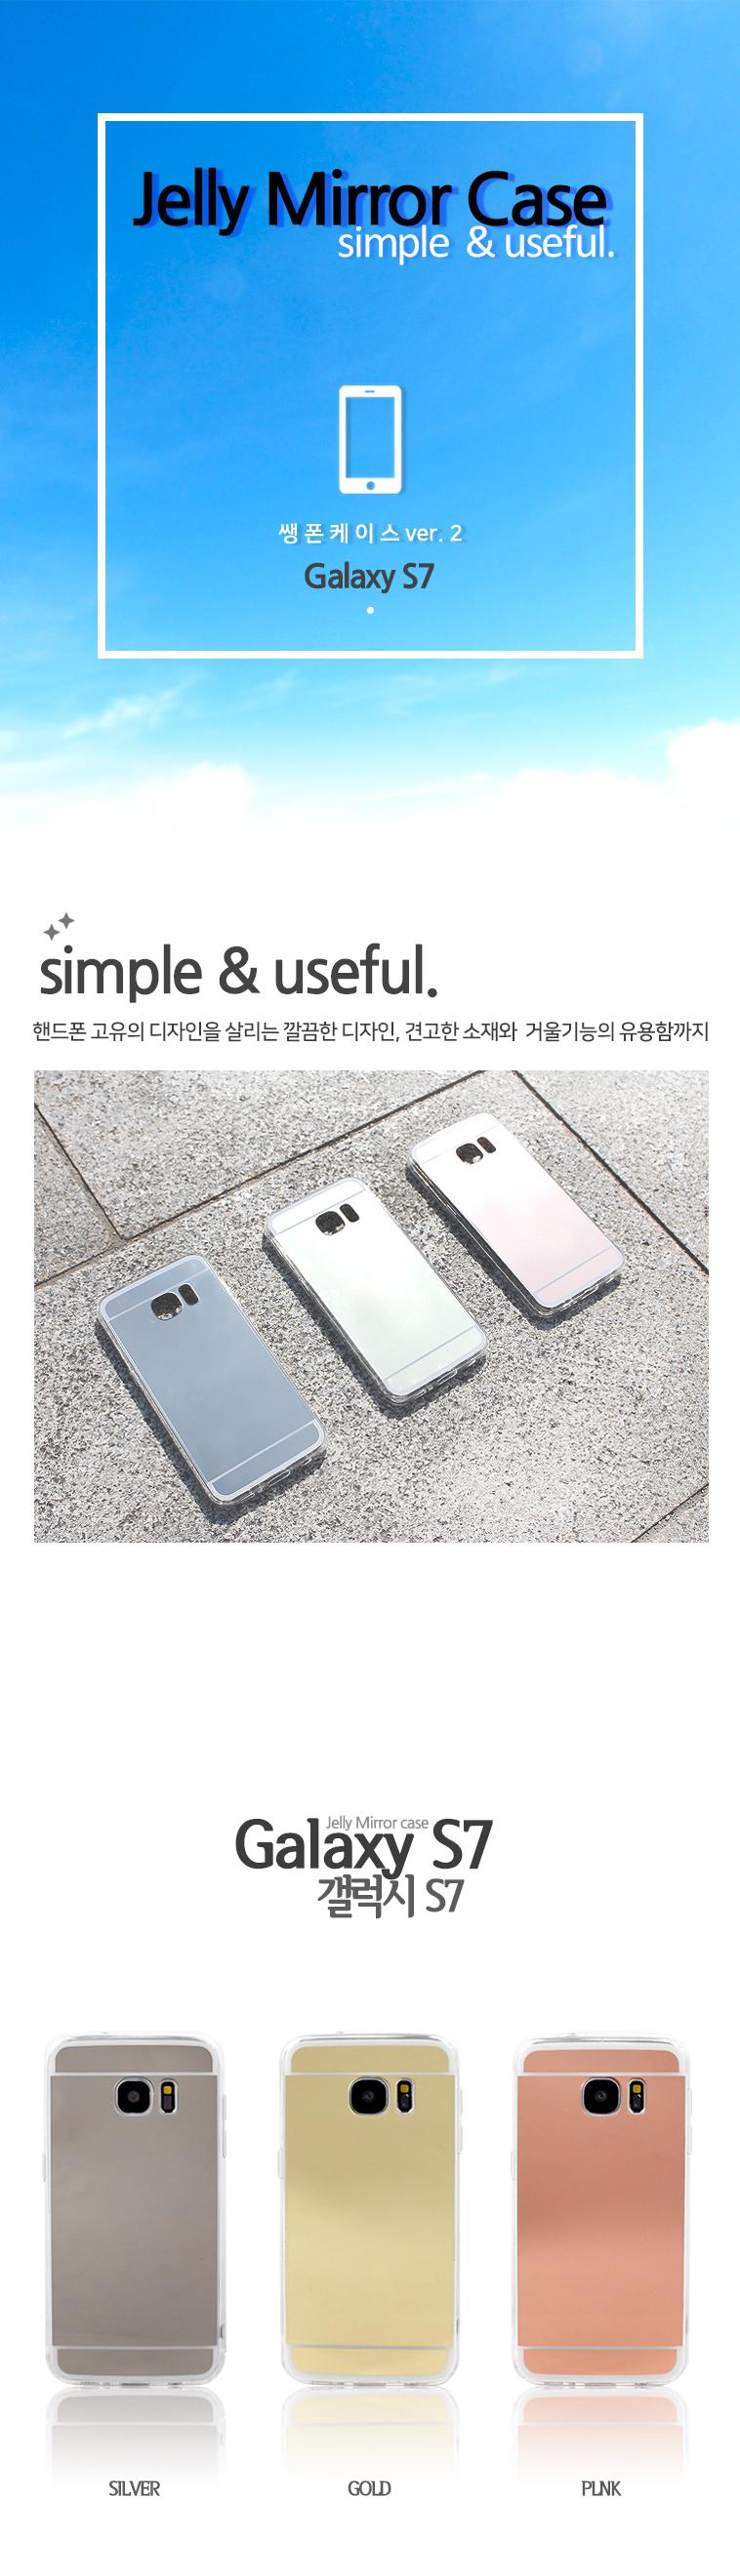 [ BISKET ] GalaxyS7 MirrorCase